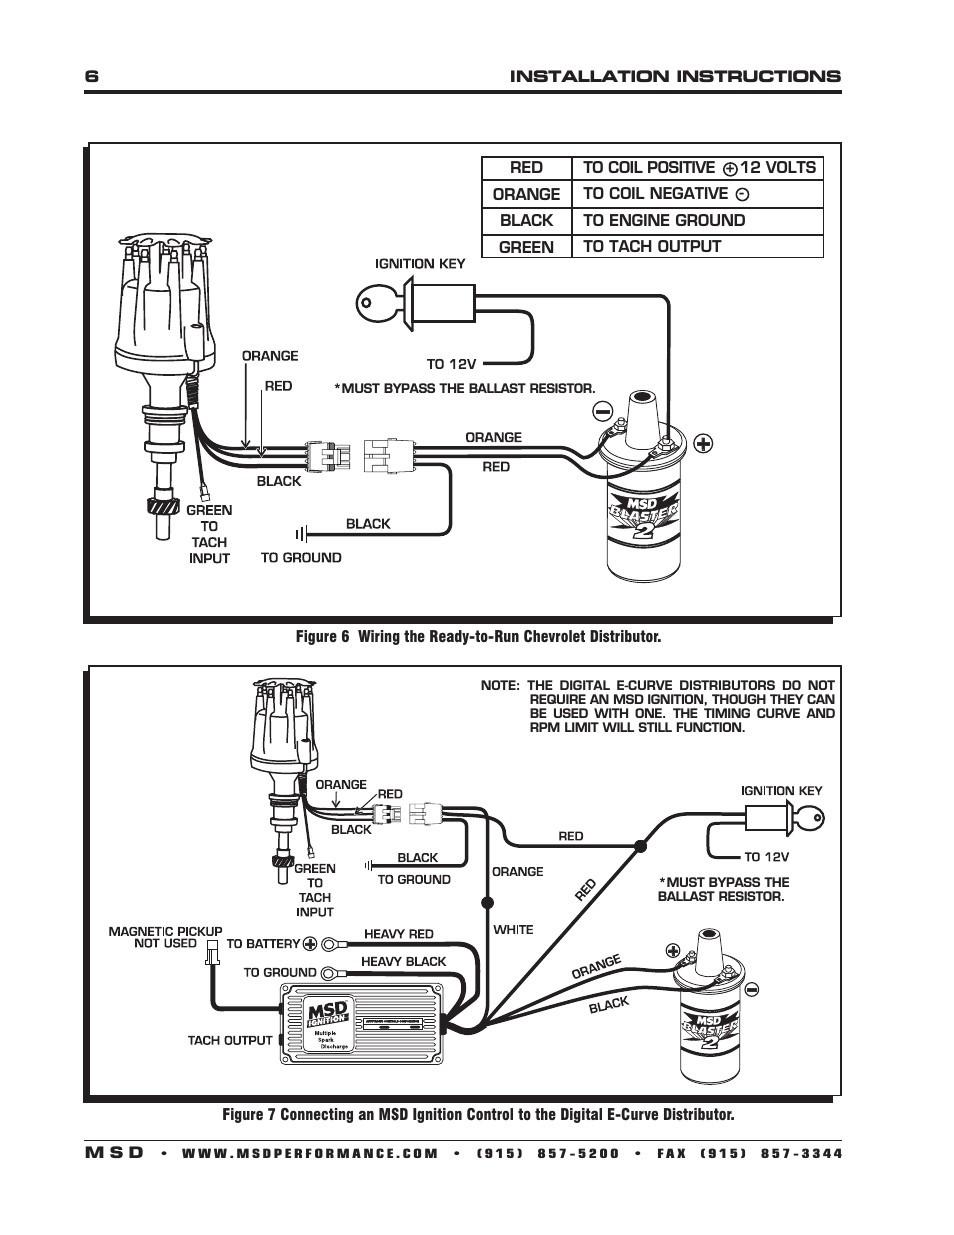 Rx7 Msd 6a Wiring Diagram | Online Wiring Diagram Mallory Hyfire Wiring Diagram Duraspark on